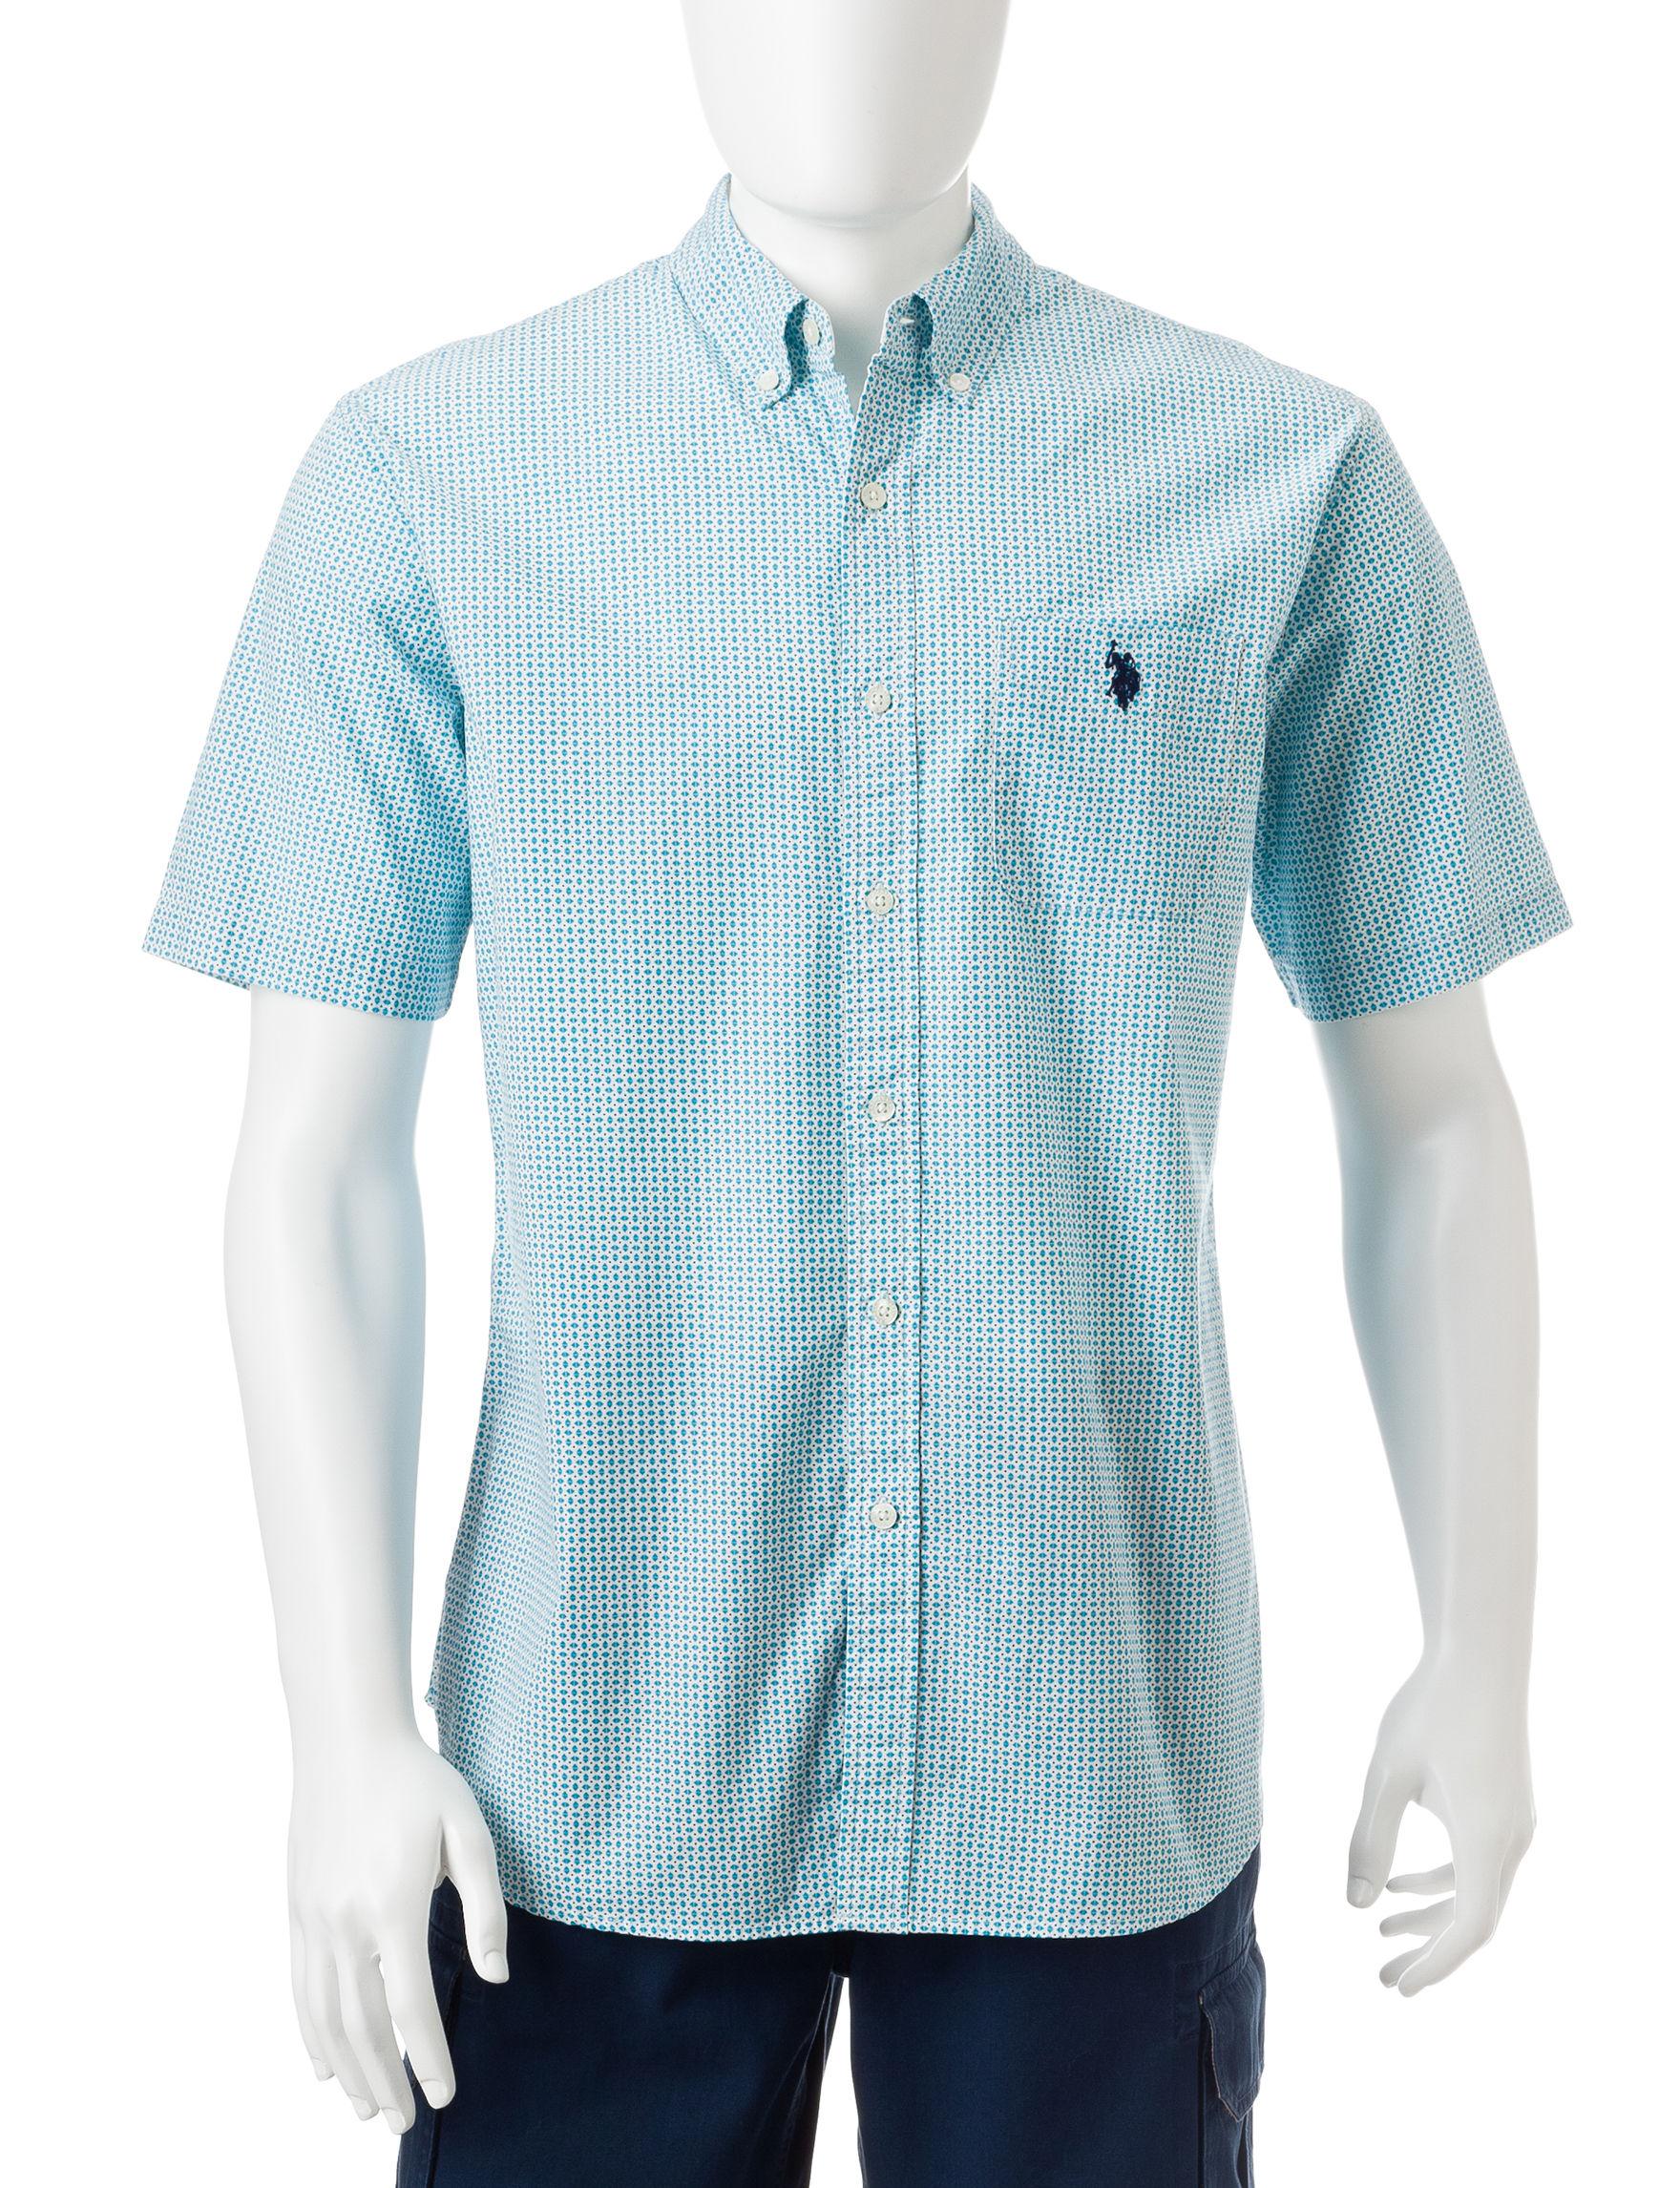 U.S. Polo Assn. Blue Casual Button Down Shirts